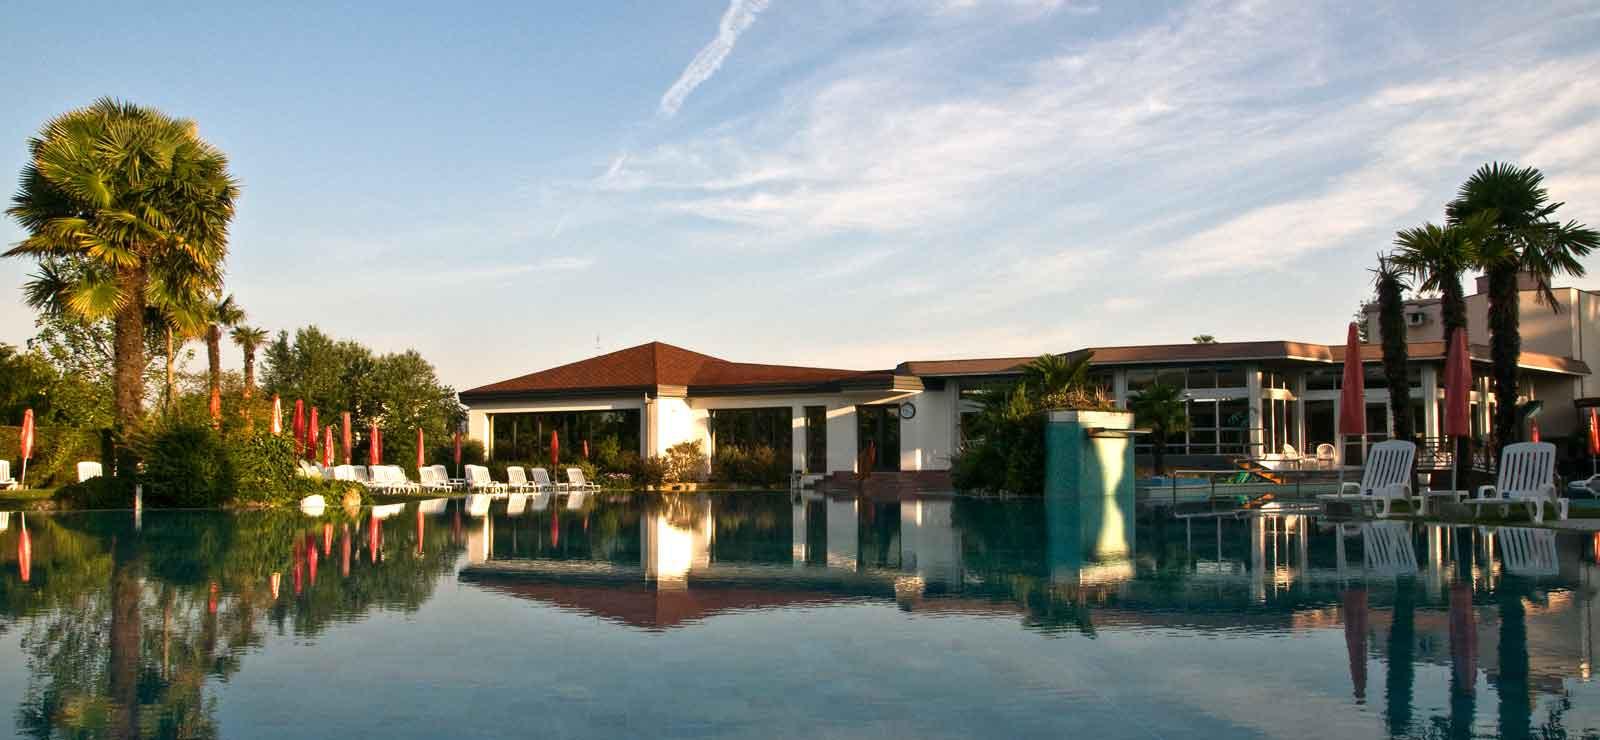 Hotel Garden Terme Montegrotto Bilder | Bild 1